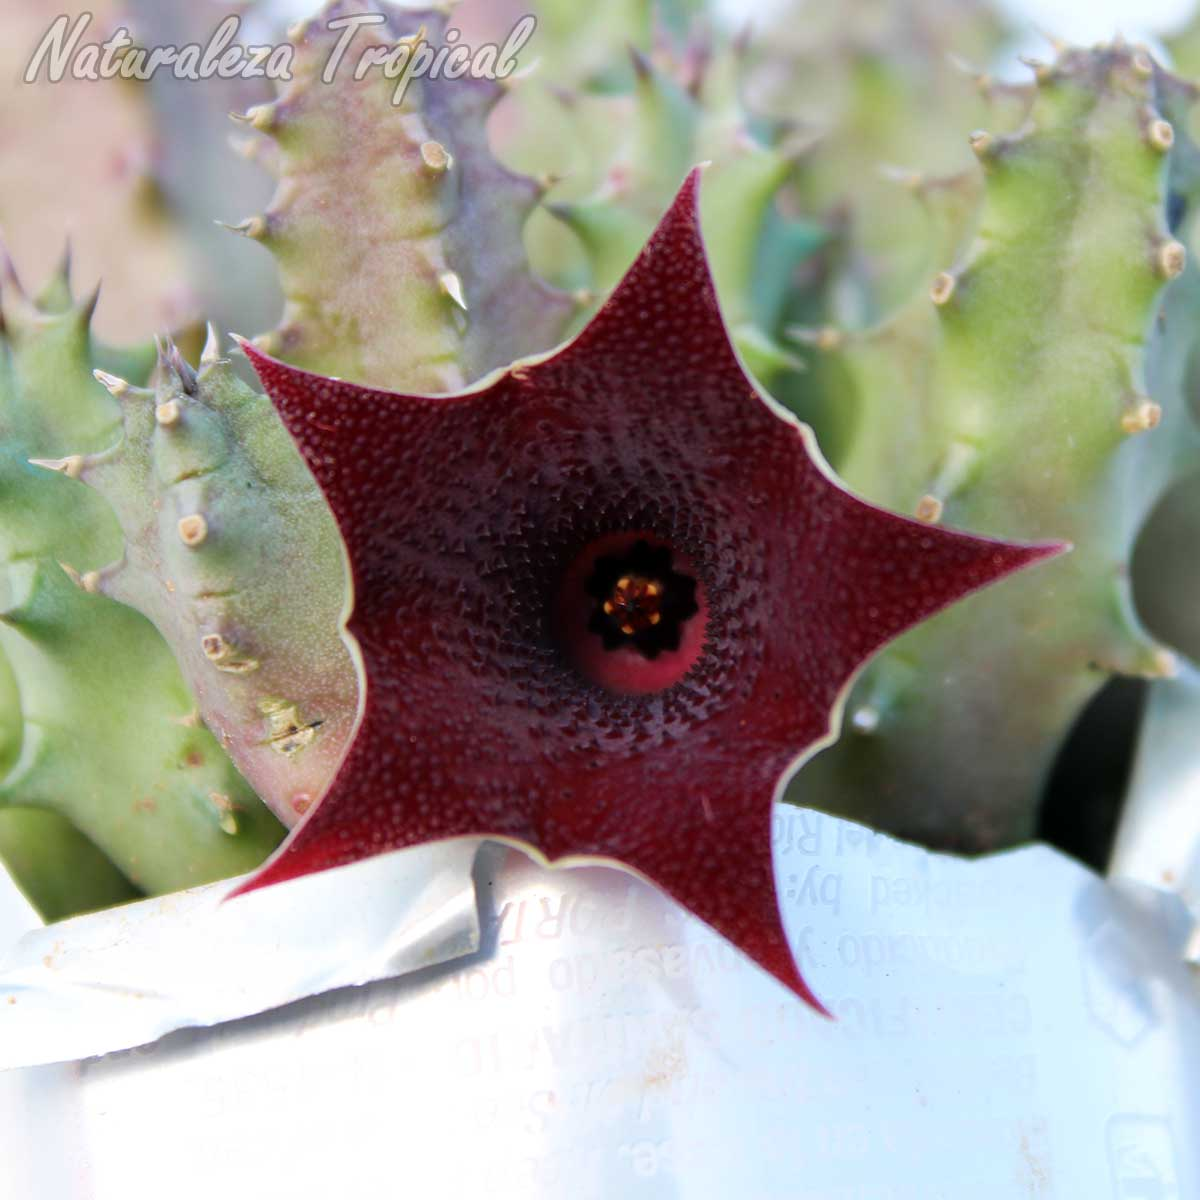 Vista frontal de la flor de la planta suculenta híbrida Huernia x macrocarpa clon 8